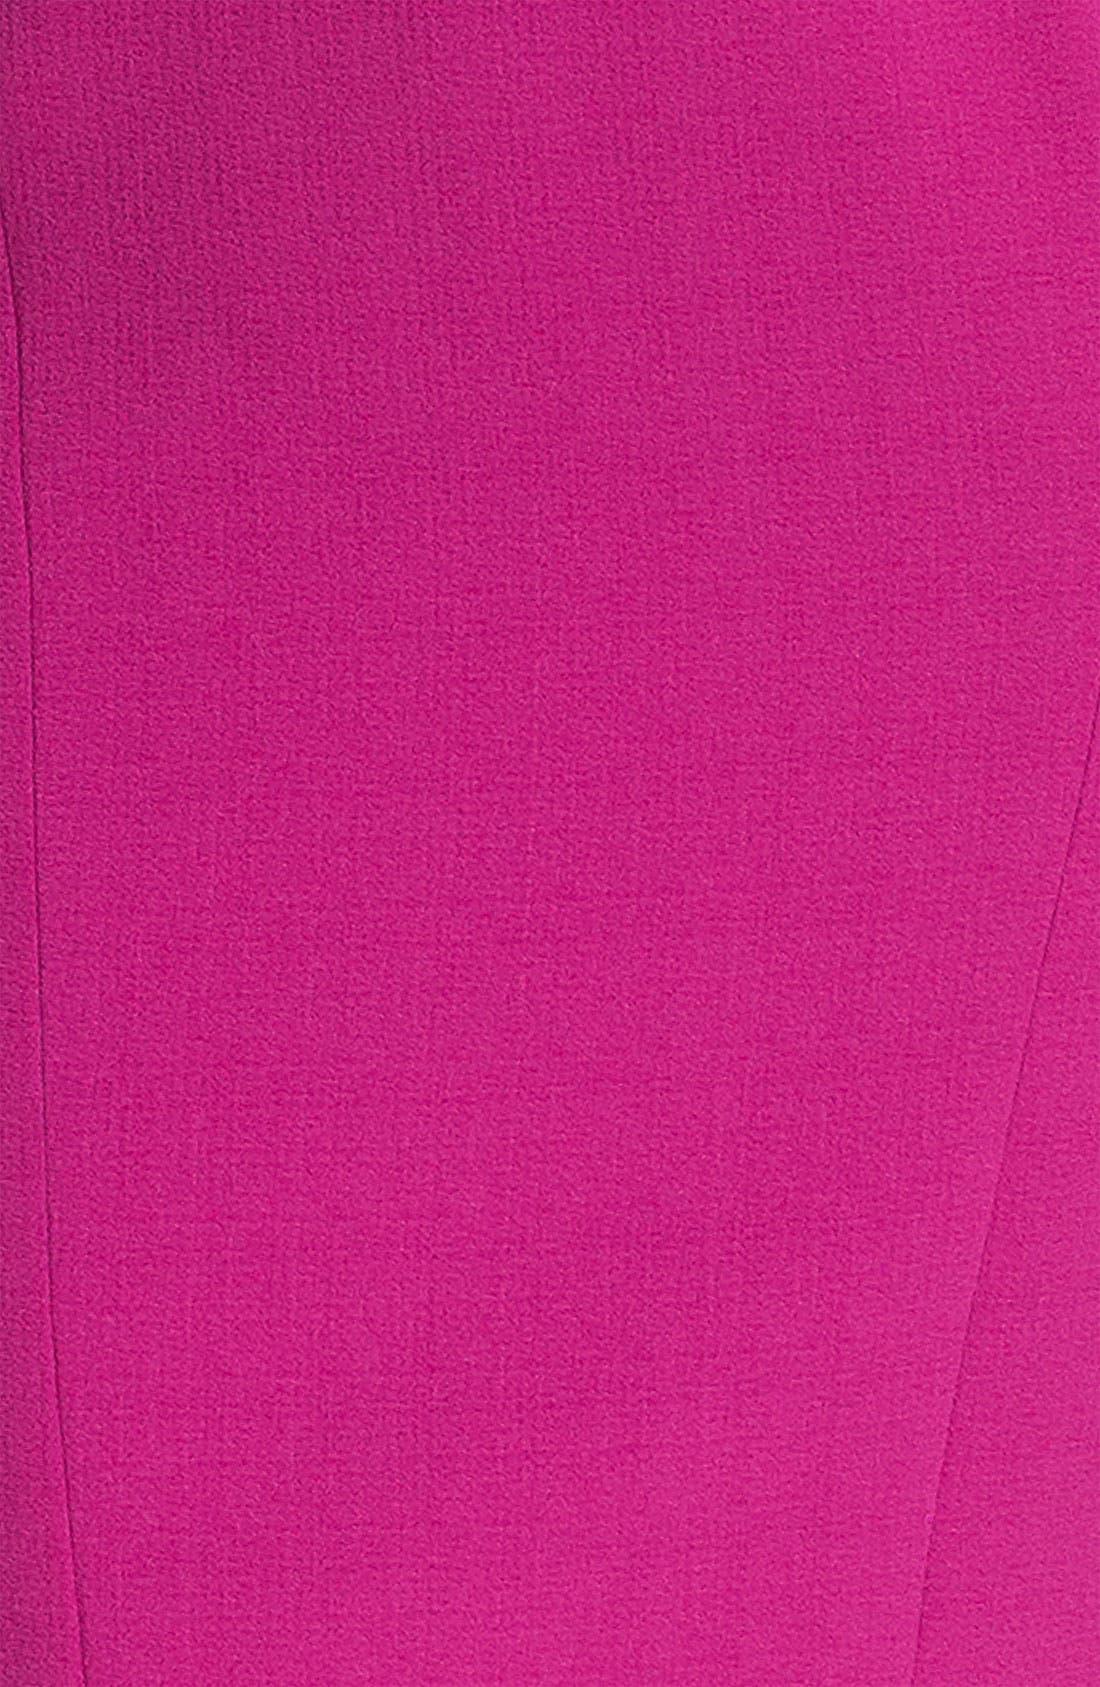 Alternate Image 3  - Anne Klein Sleeveless Sheath Dress